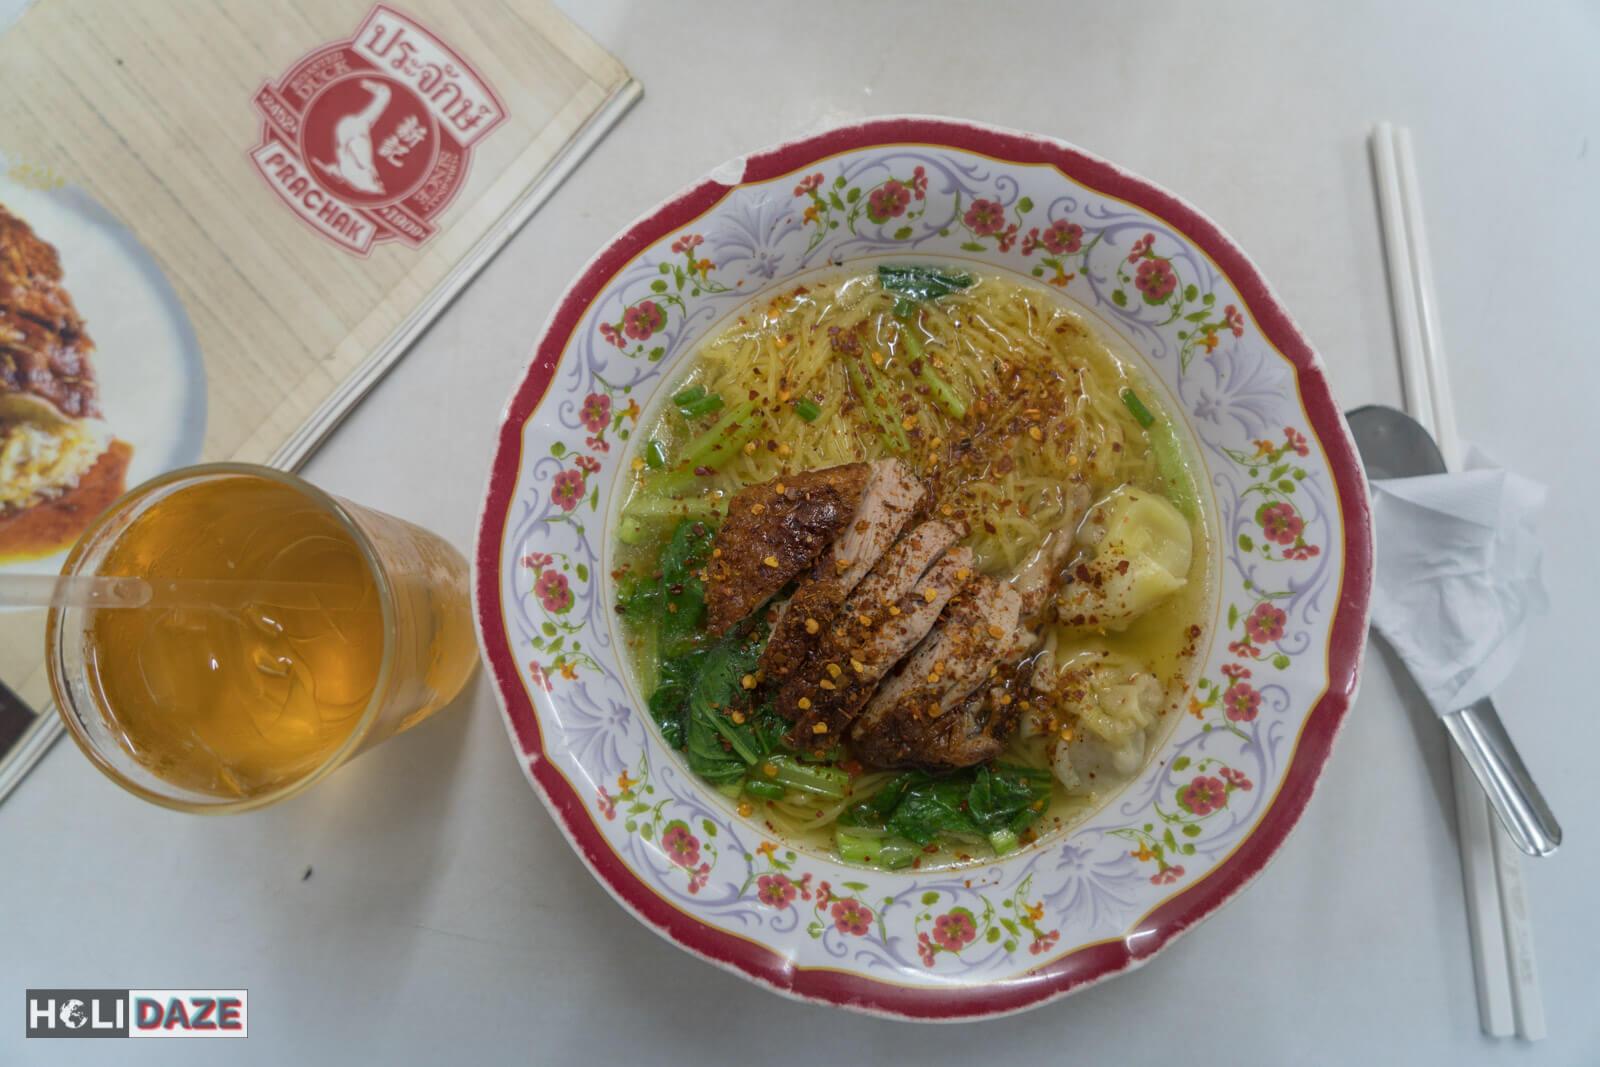 Roast duck noodle soup with pork wontons and ice tea at Prachak in Bangrak, Bangkok